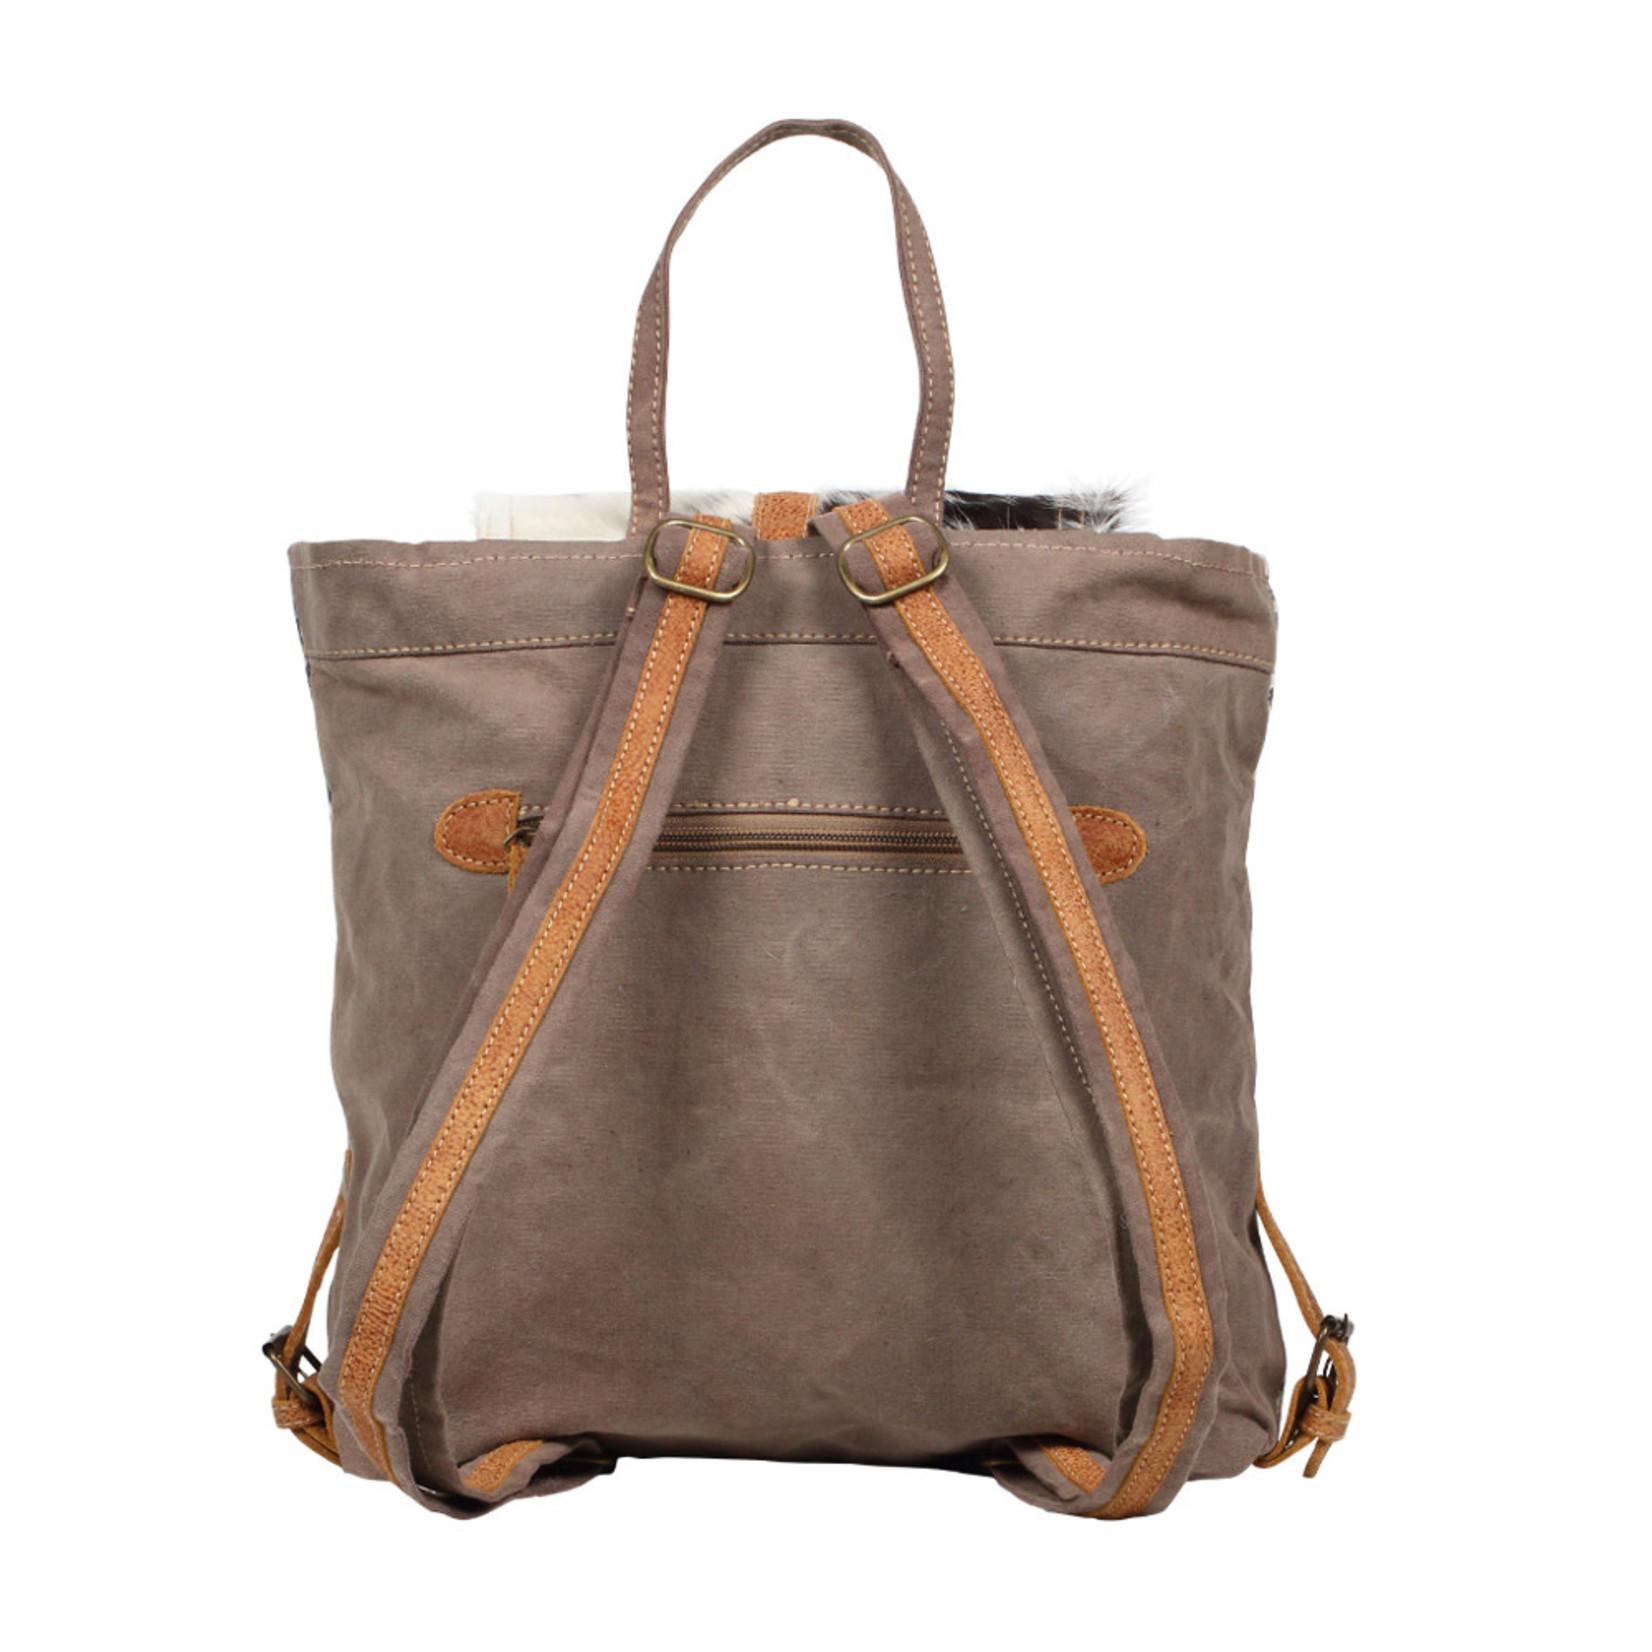 Myra Bags S-1269 Ori Backpack Bag